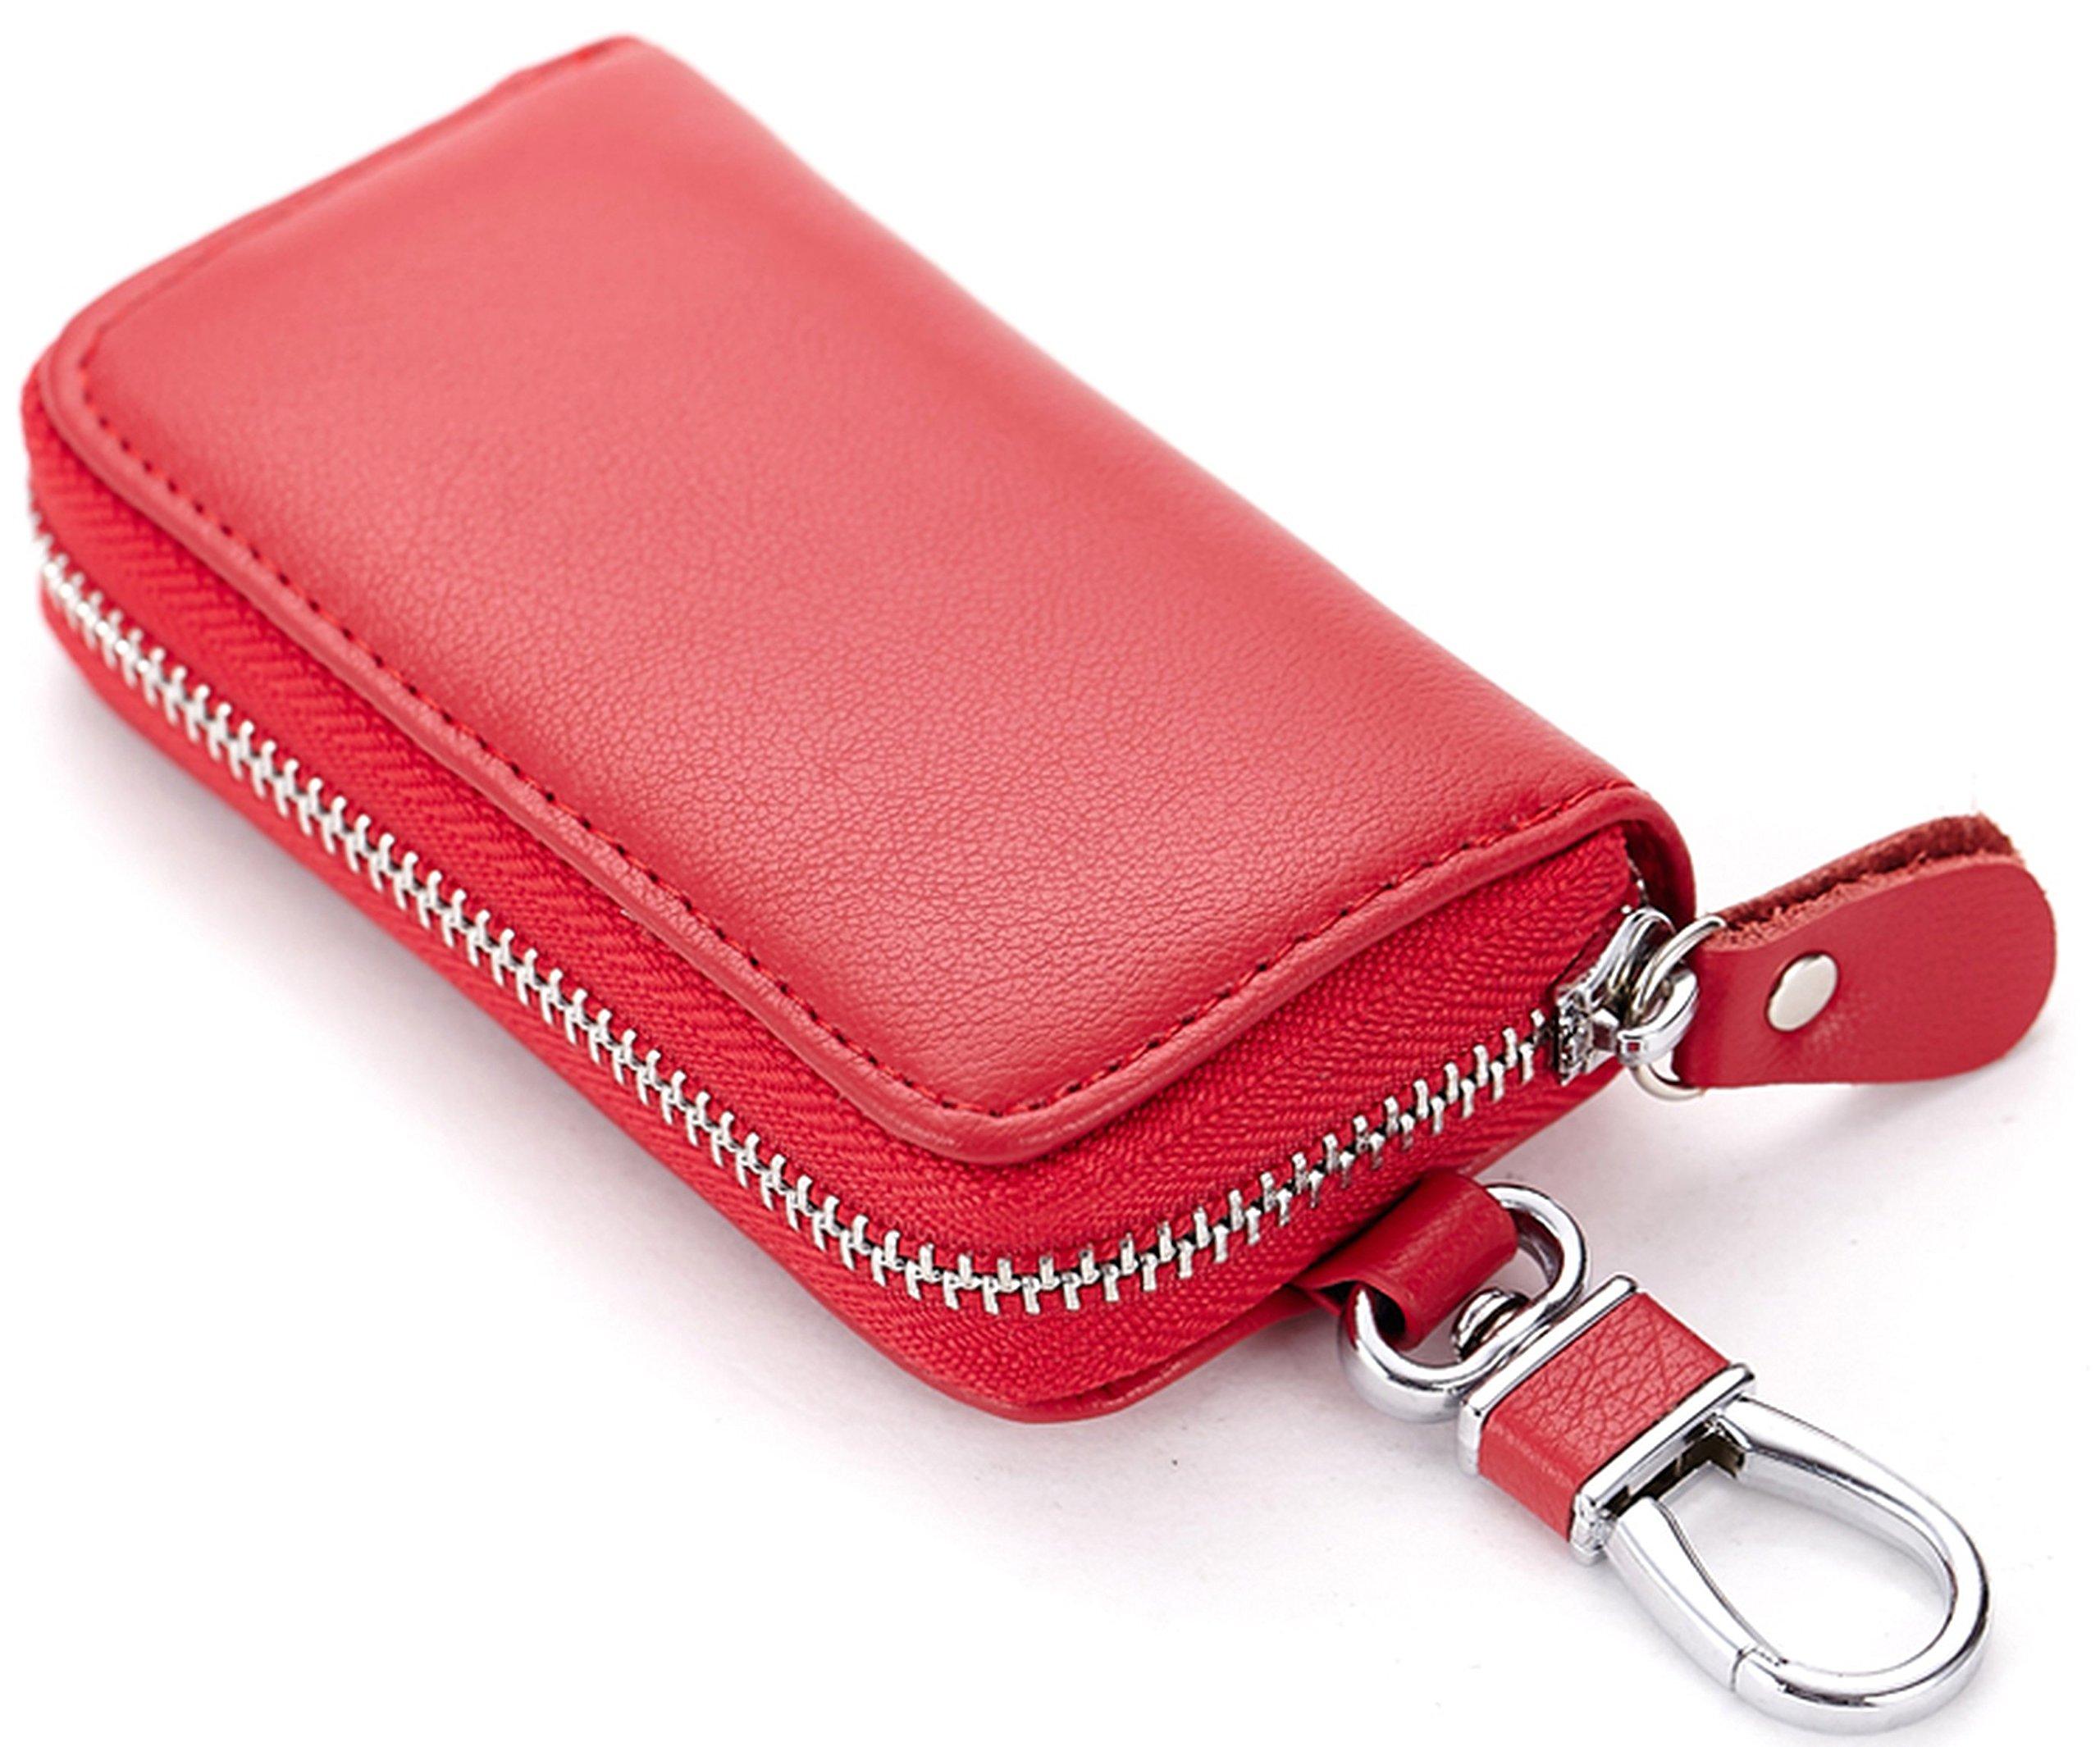 Unisex Universal Leather Car Key Zipper Case Wallet Snap Closure Key Ring Card Slots, Red, b6w006rd